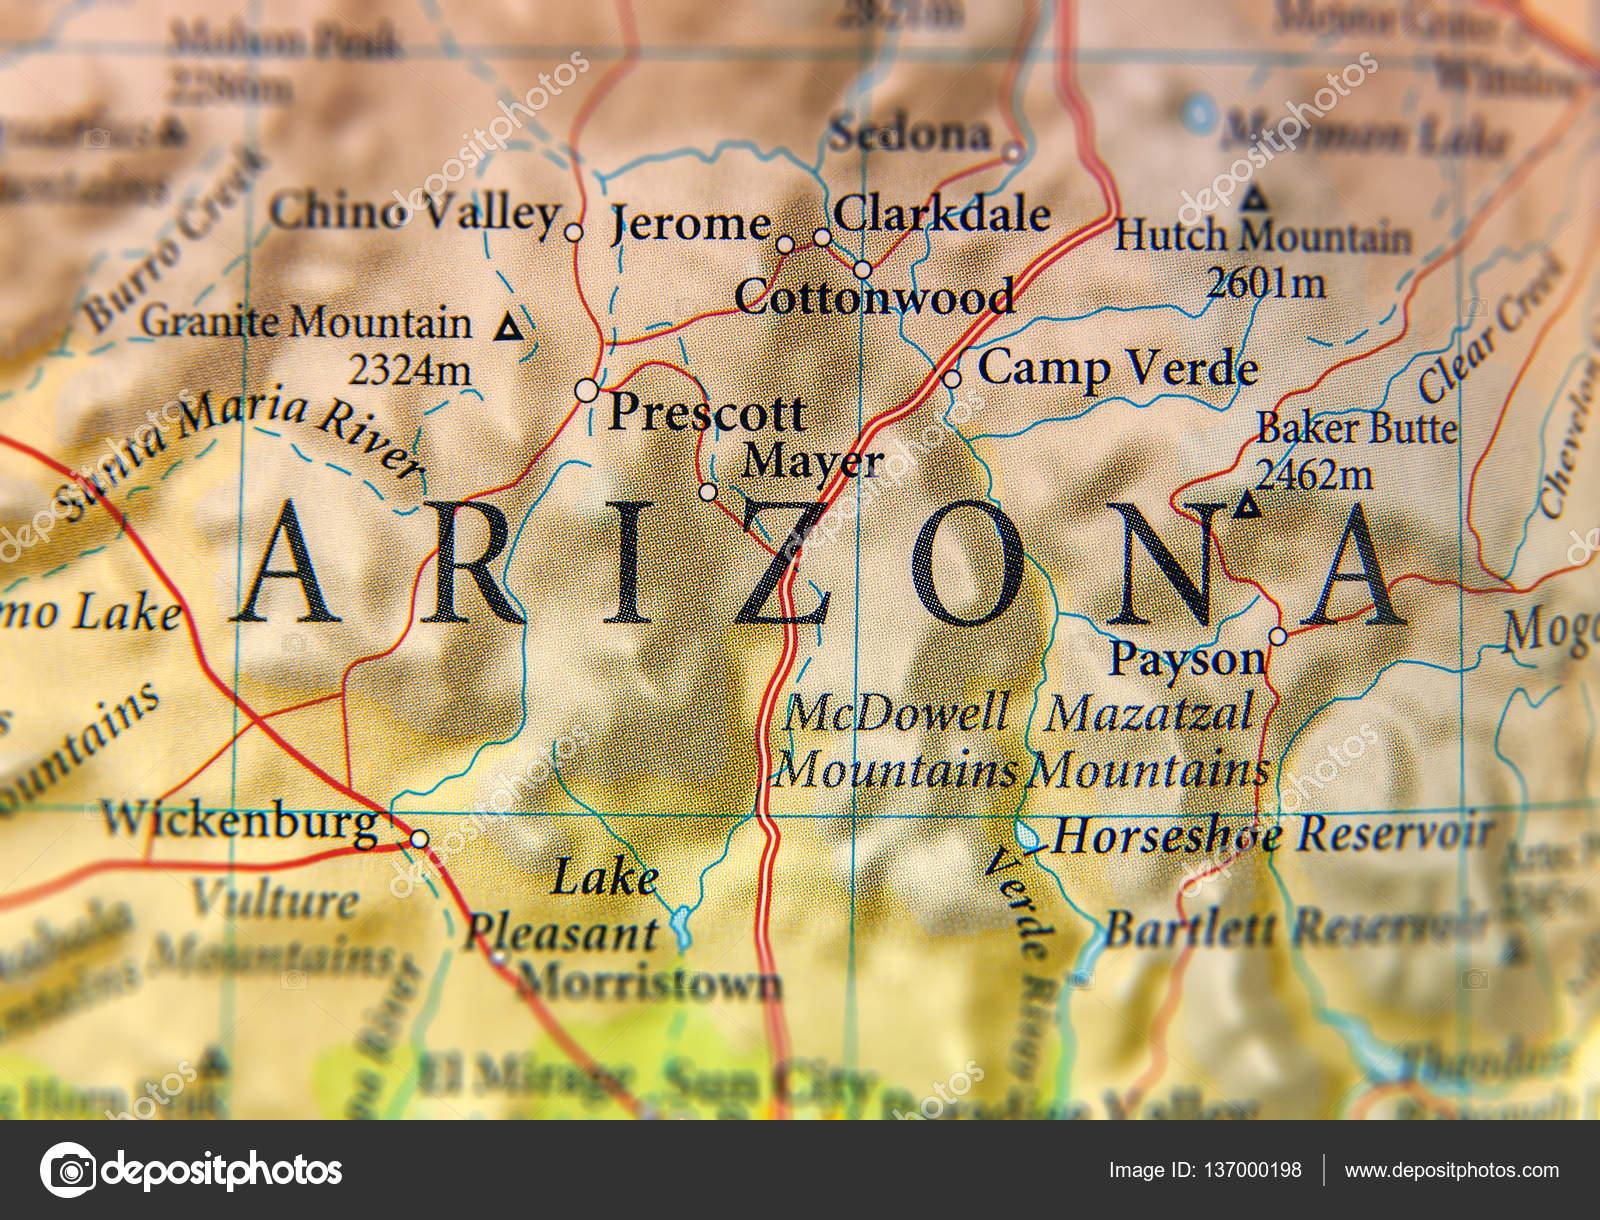 Geographic map of Arizona state close — Stock Photo ... on ohio map, missouri map, arizona economy map, arizona college team, az map, texas map, oklahoma map, colorado map, university of washington map, phoenix map, georgia map, arkansas map, tennessee map, utah map, florida map, arizona territory map, new mexico map, wisconsin map, tucson map, usa map,